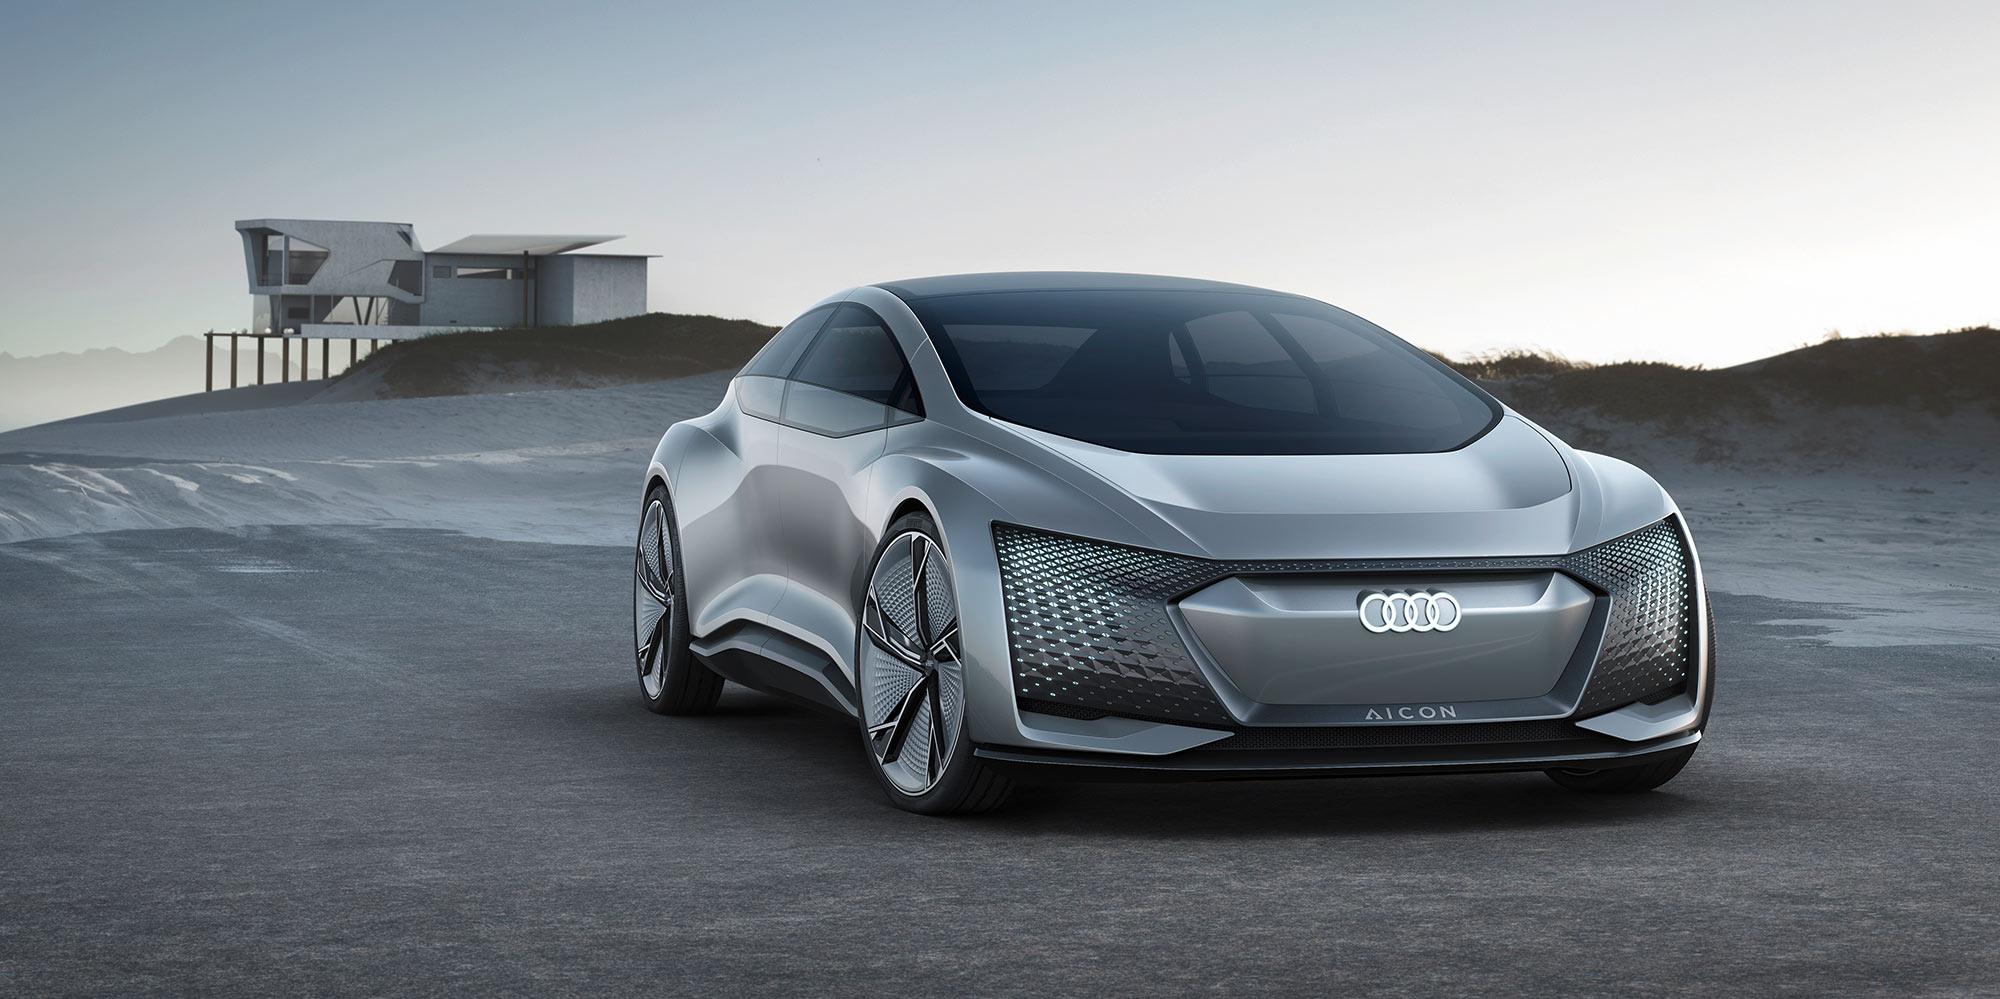 Audi To Showcase Next Gen Ev Technology With Possible A9 E Tron Due In 2024 Electrek